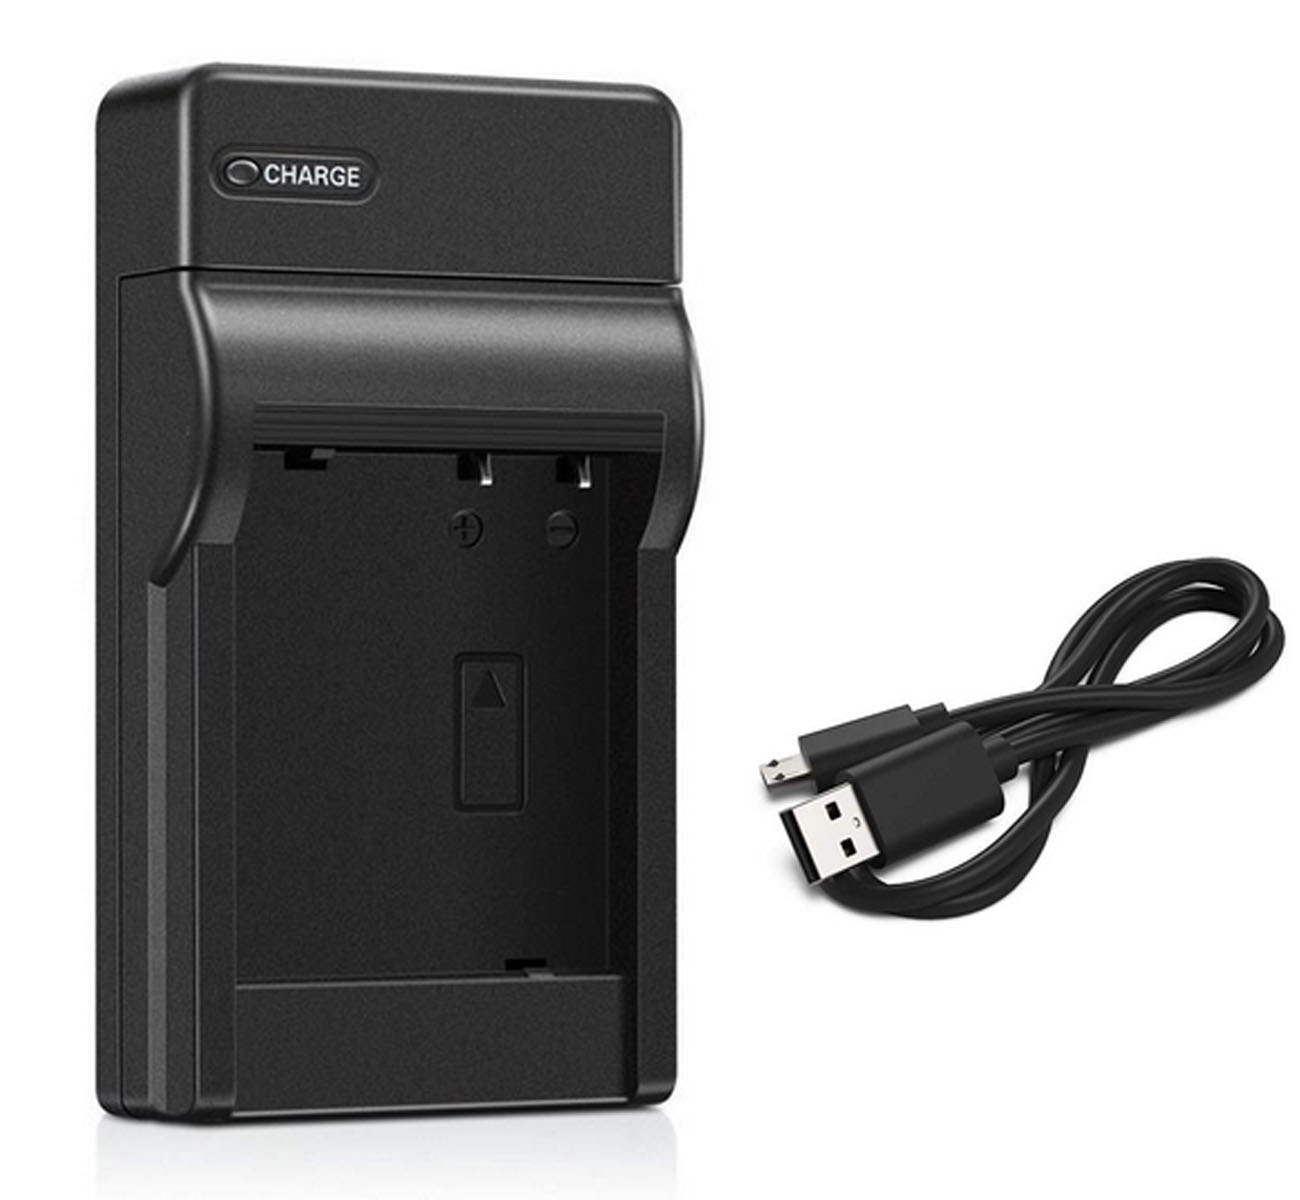 ZR45MC MiniDV Camcorder ZR40 Smart Slim Micro USB Battery Charger for Canon ZR10 ZR25MC ZR30MC ZR20